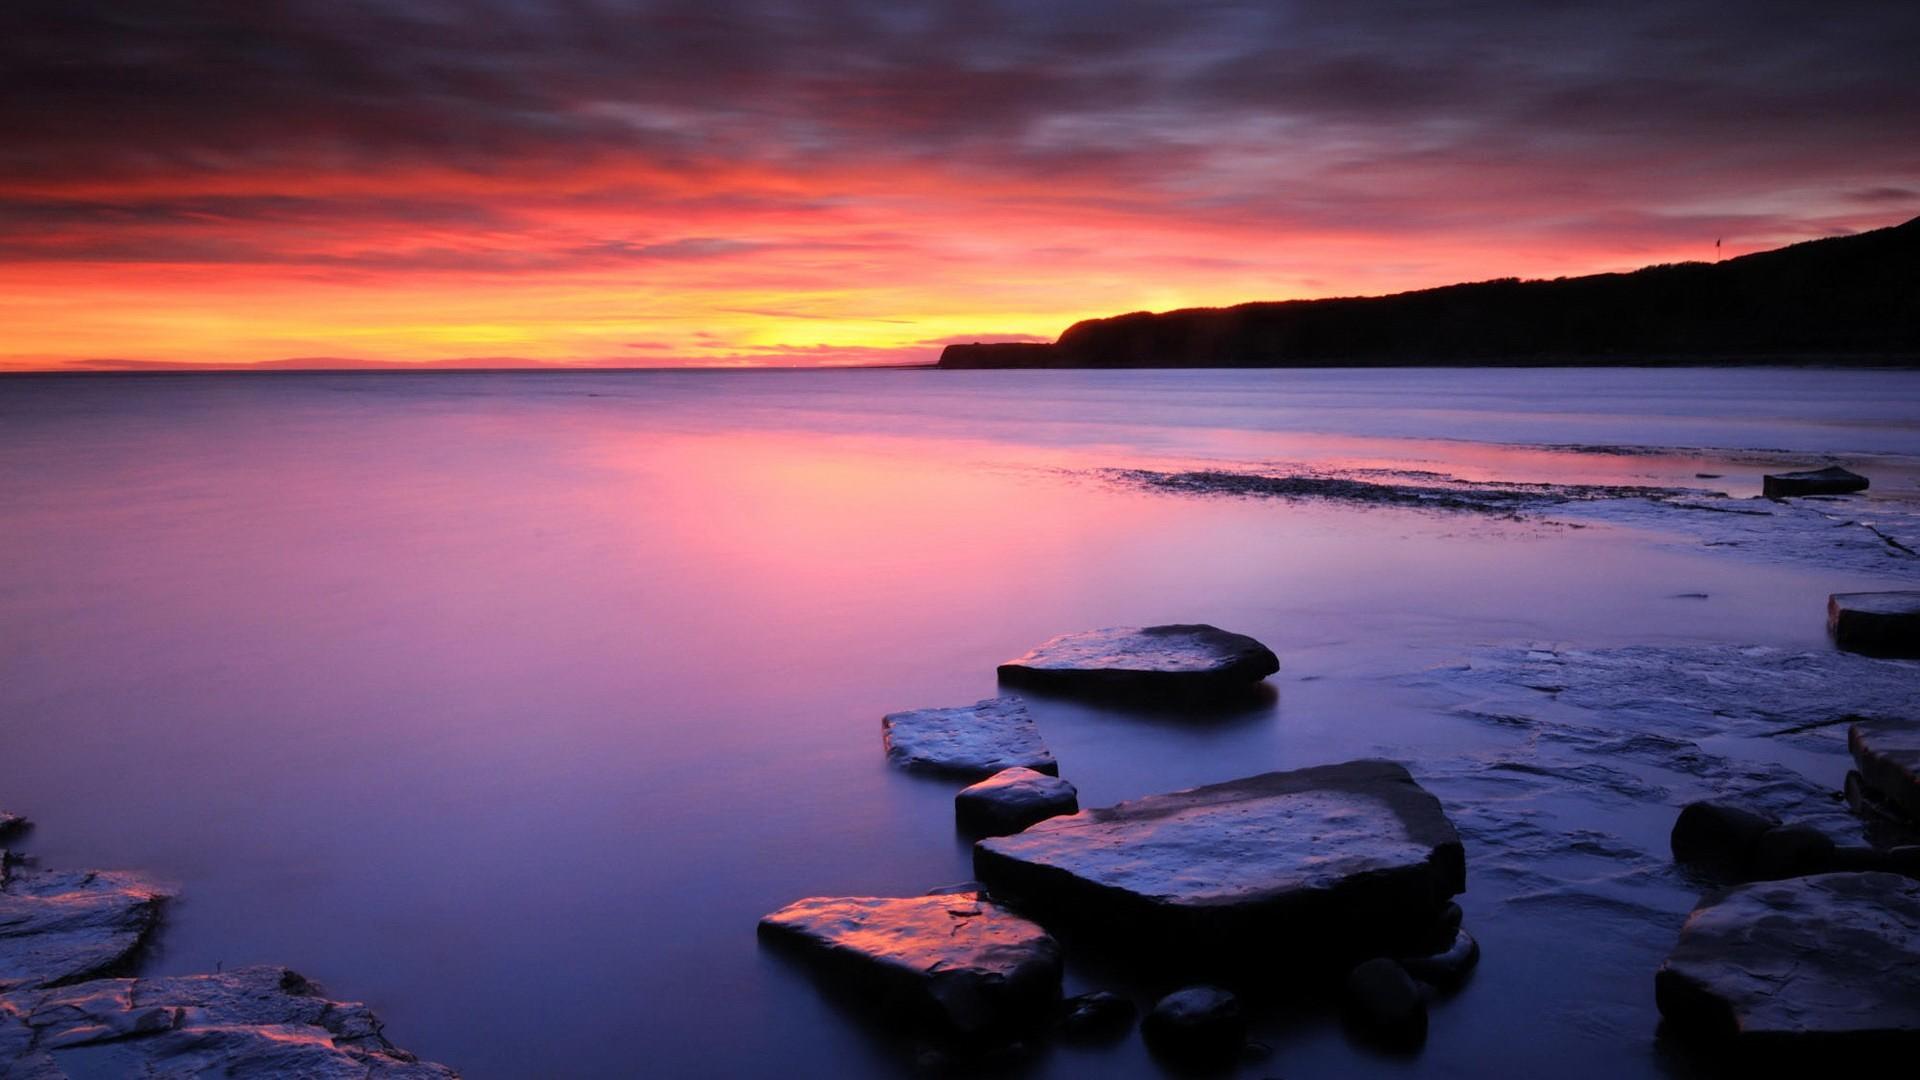 Sunset on Ice Beach Wallpapers